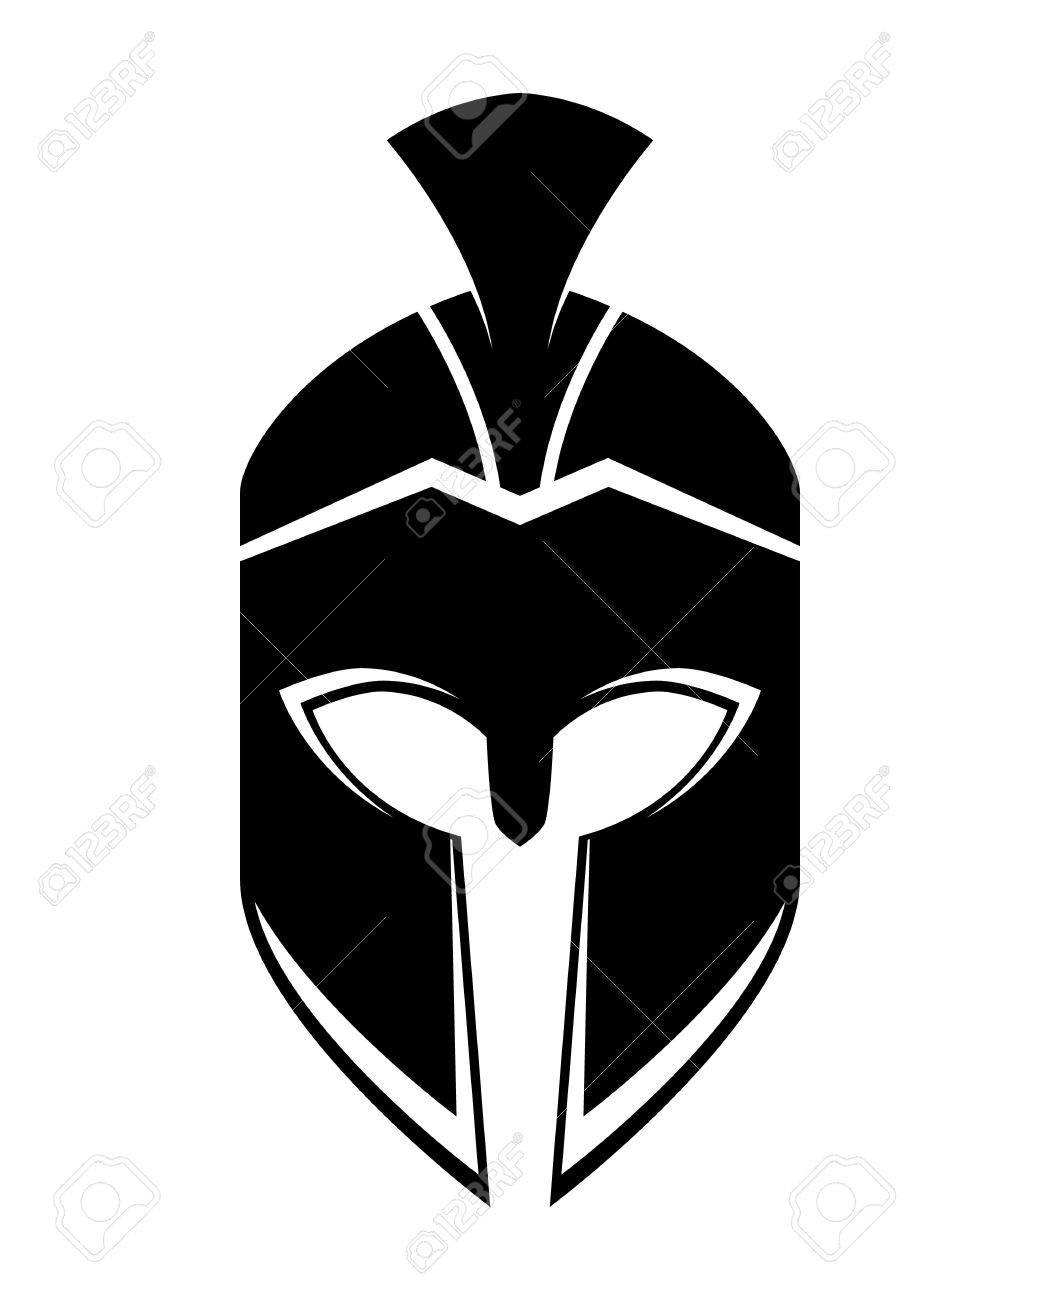 74093c926aad3 Spartan helmet logo template vector illustration Stock Vector - 85801126